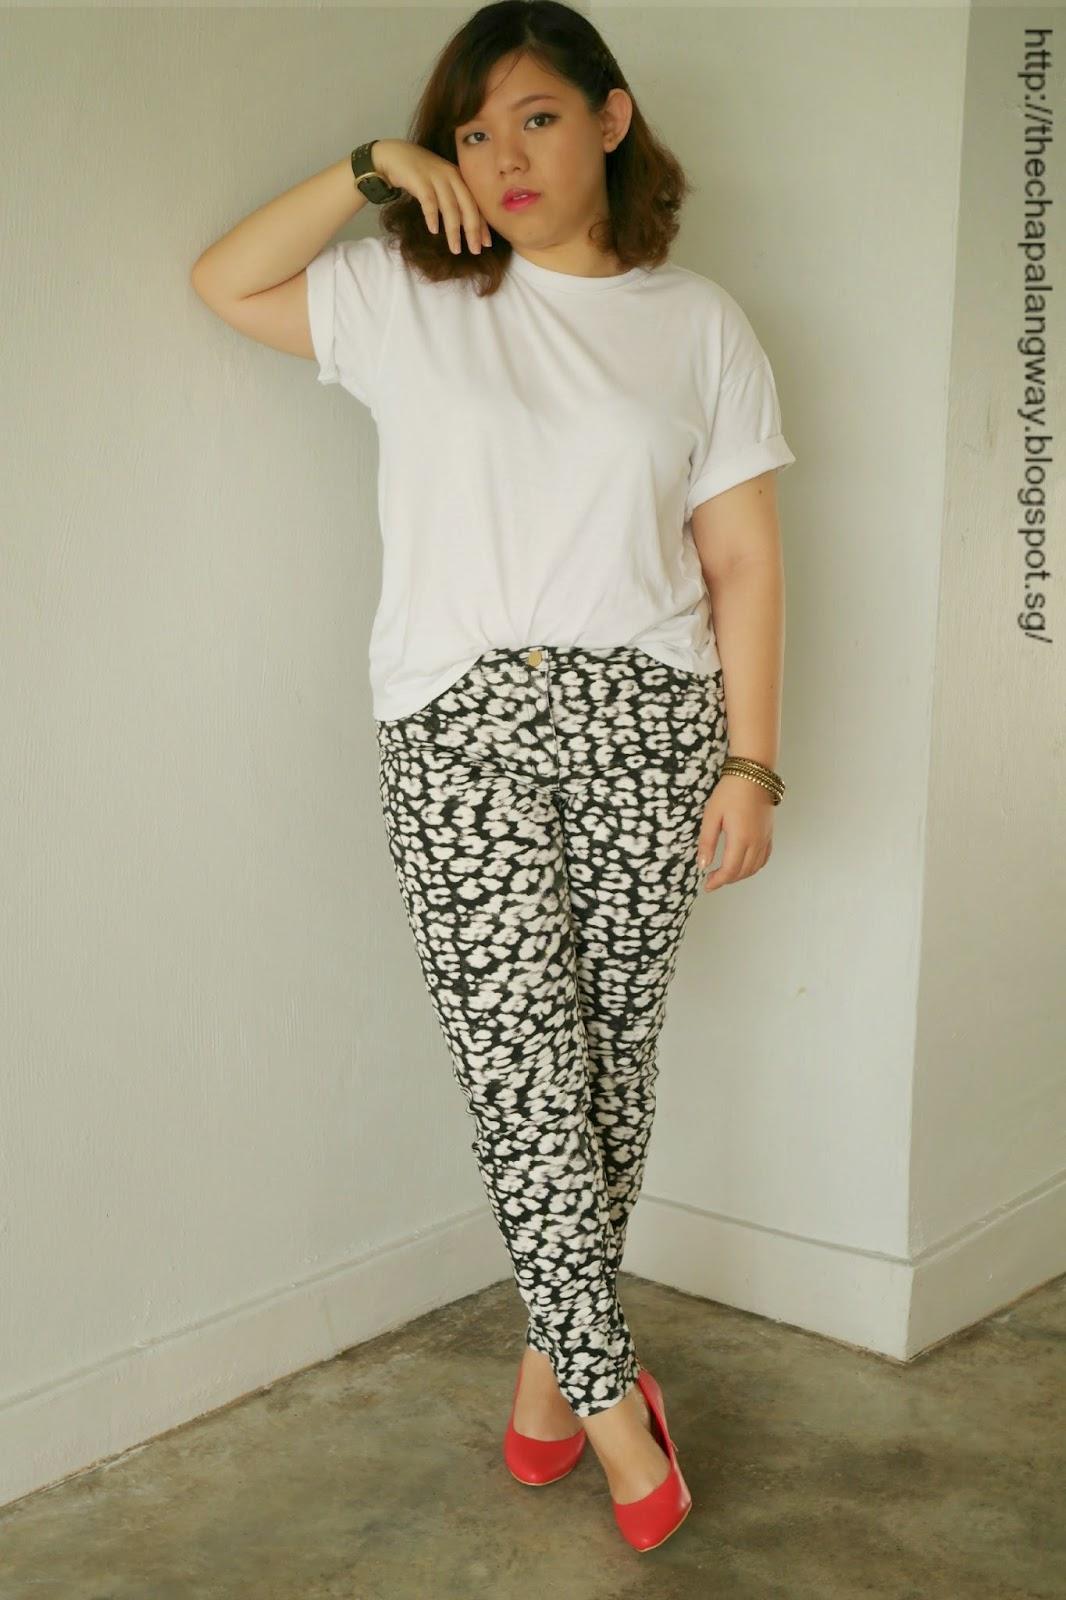 37ba400c61ca7f plain white tee, styling white shirt, pairing printed pants, H&M, edgy look